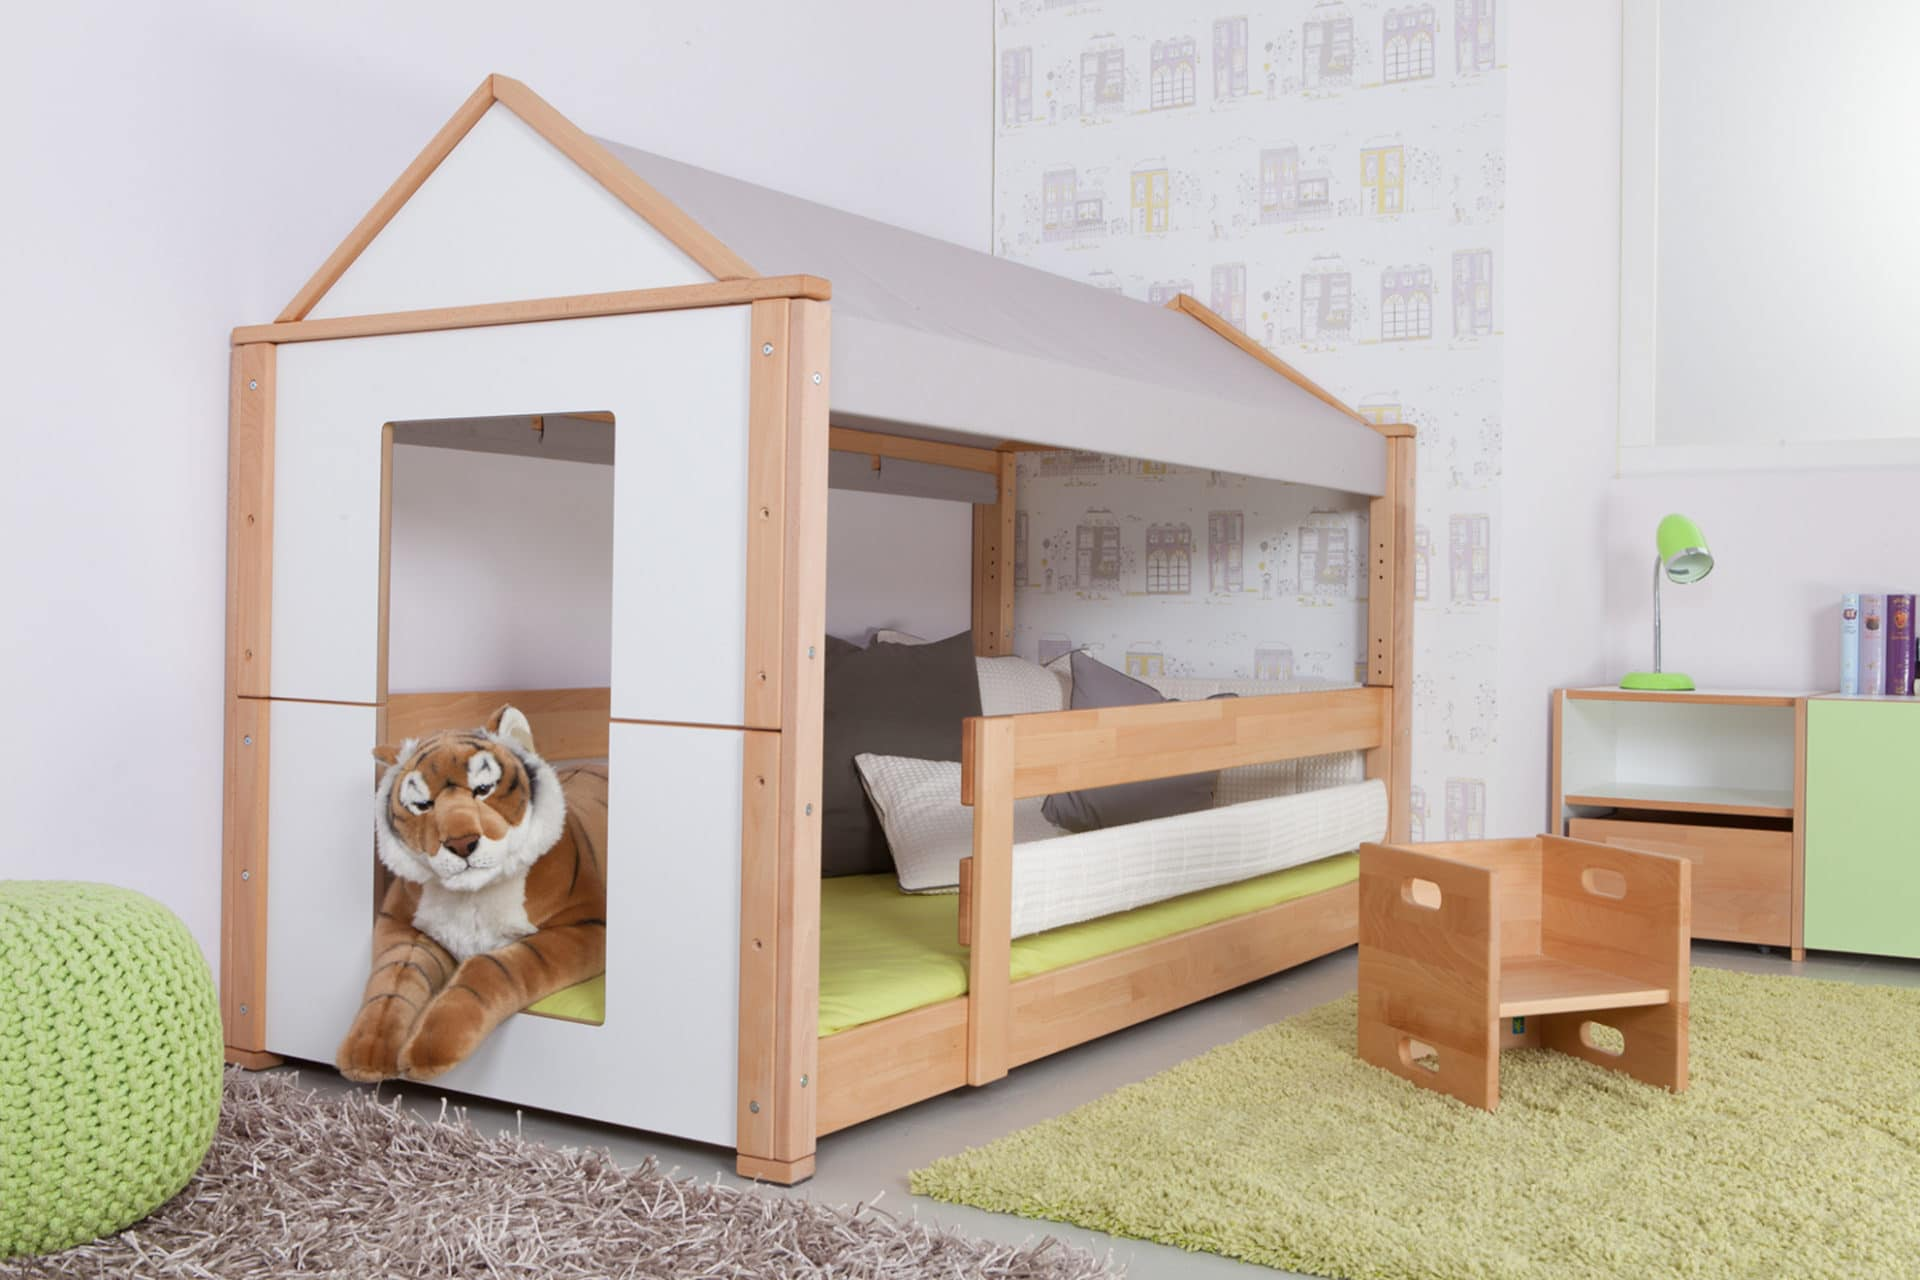 Kinderbett spielhaus  Kinderbett debe.delite - Wohnopposition Berlin